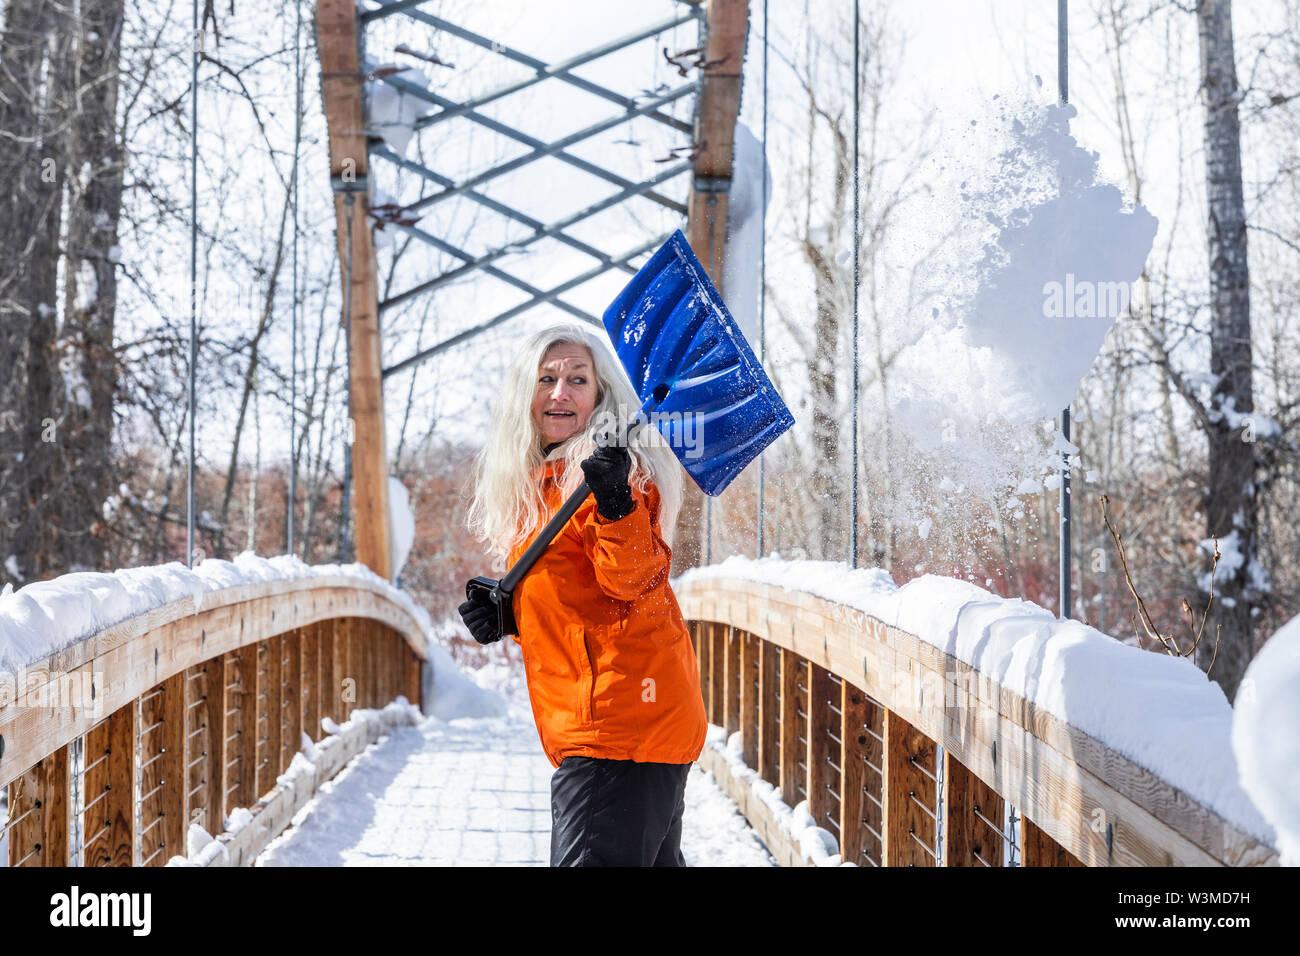 Mature woman shoveling snow off of footbridge - Stock Image